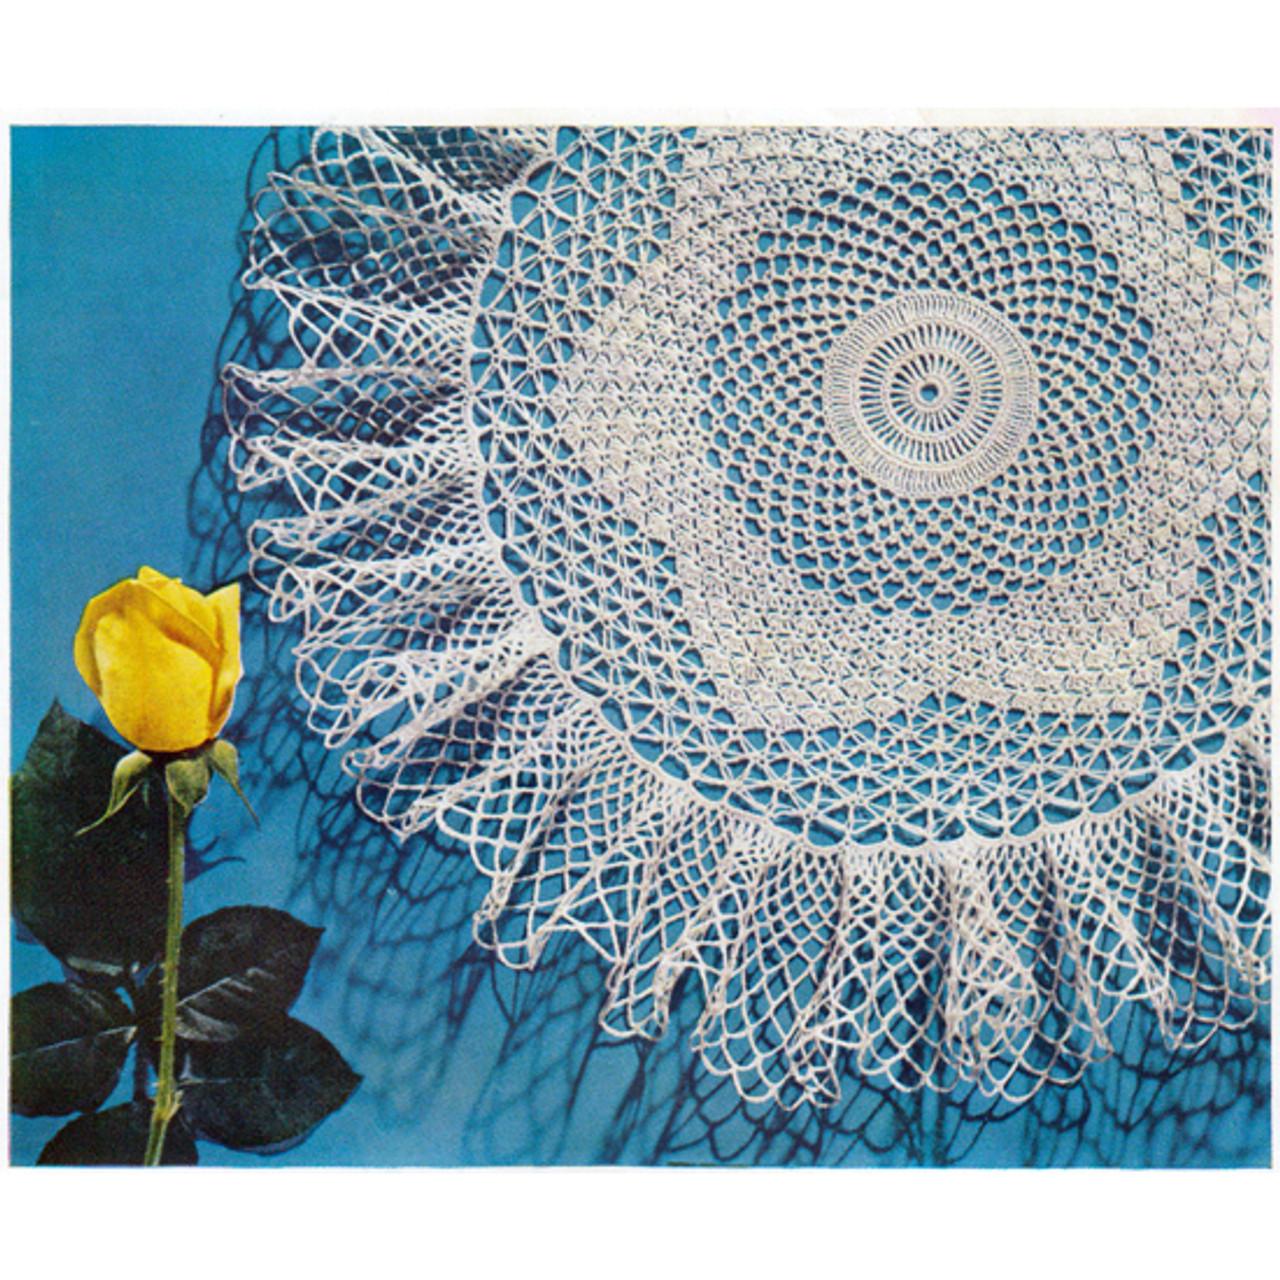 Vintage Rock Pool Crochet Doily Pattern from Coats & Clarks